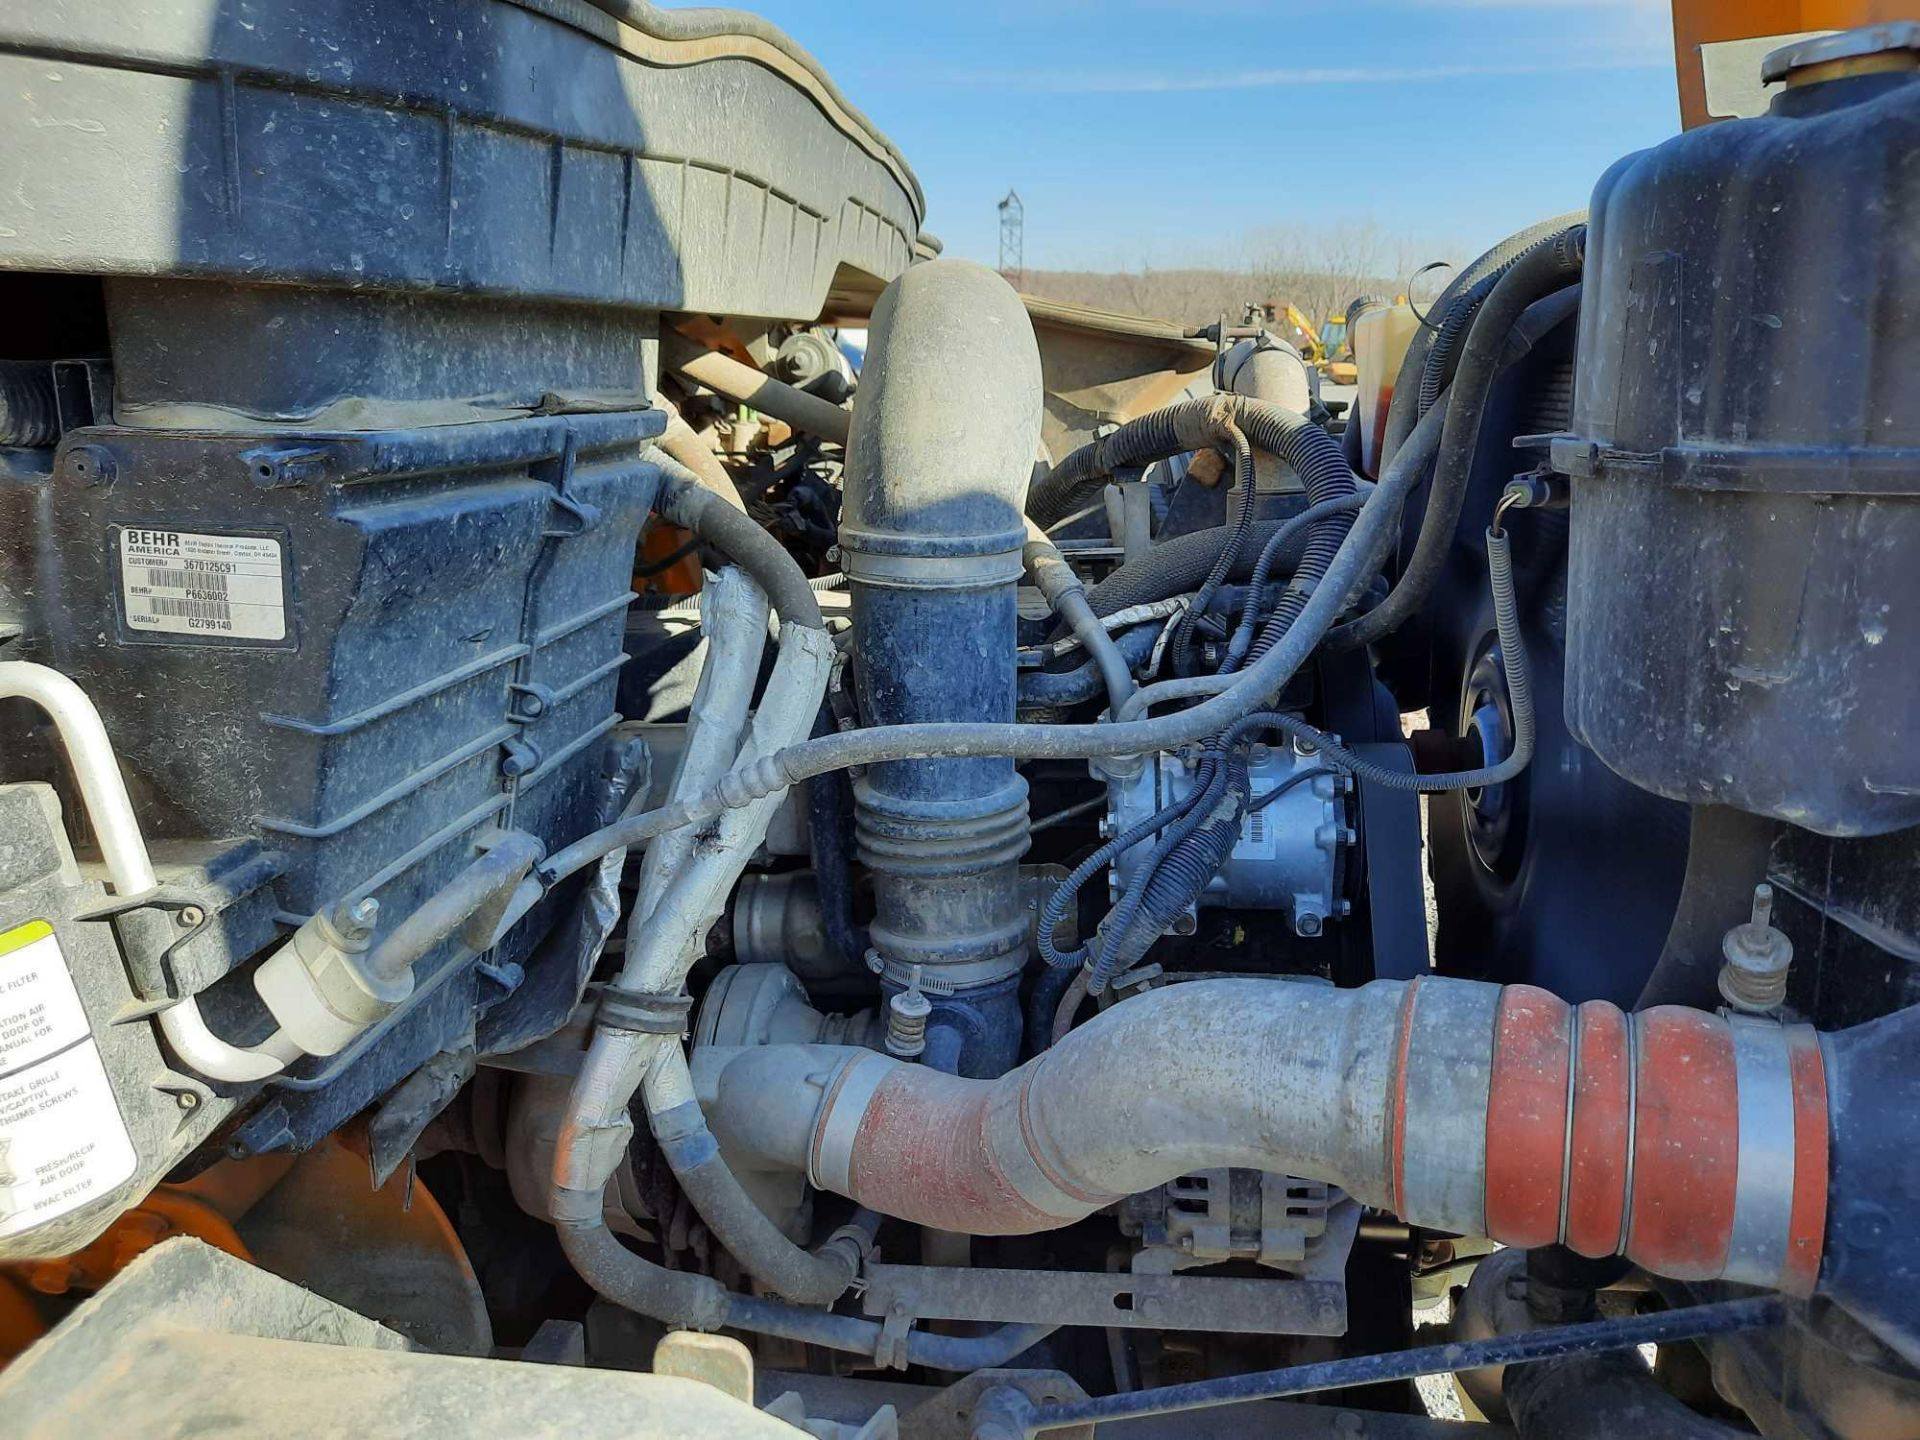 2010 INTERNATIONAL 7300S KNUCKLEBOOM TRUCK - Image 11 of 18